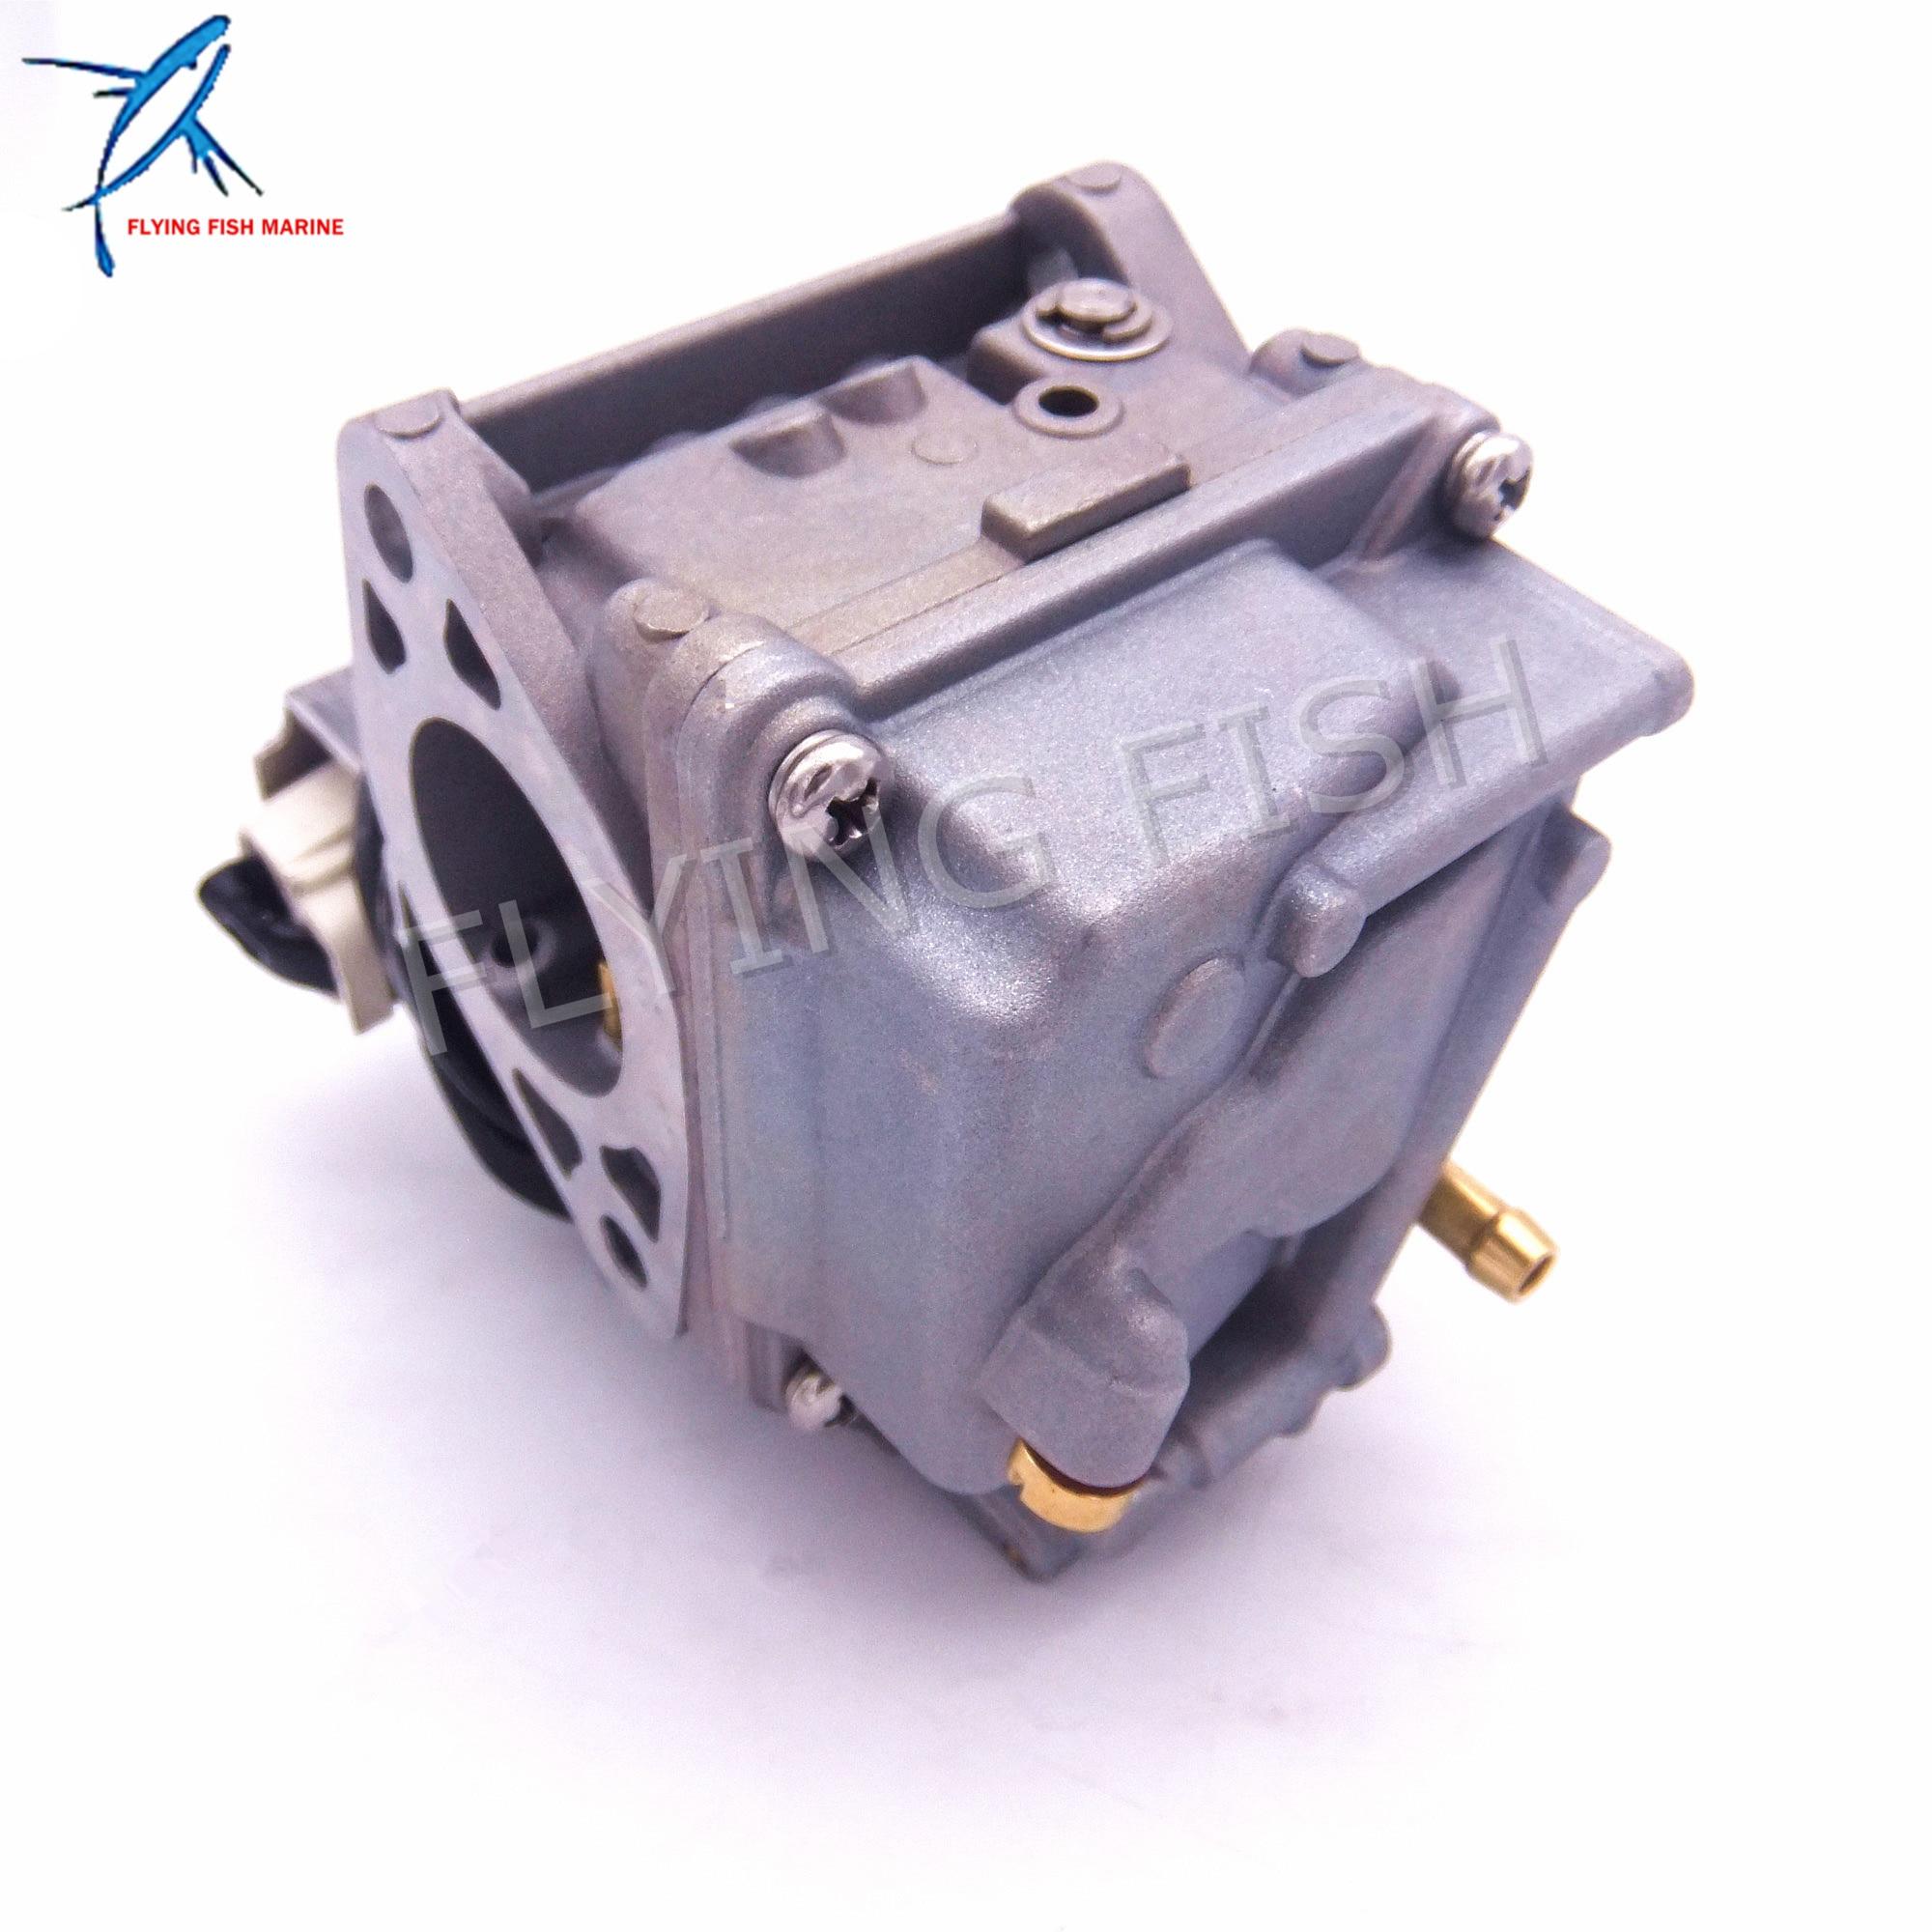 yamaha f20 outboard carburetor wiring wiring diagram query yamaha f20 outboard carburetor wiring [ 2000 x 2000 Pixel ]